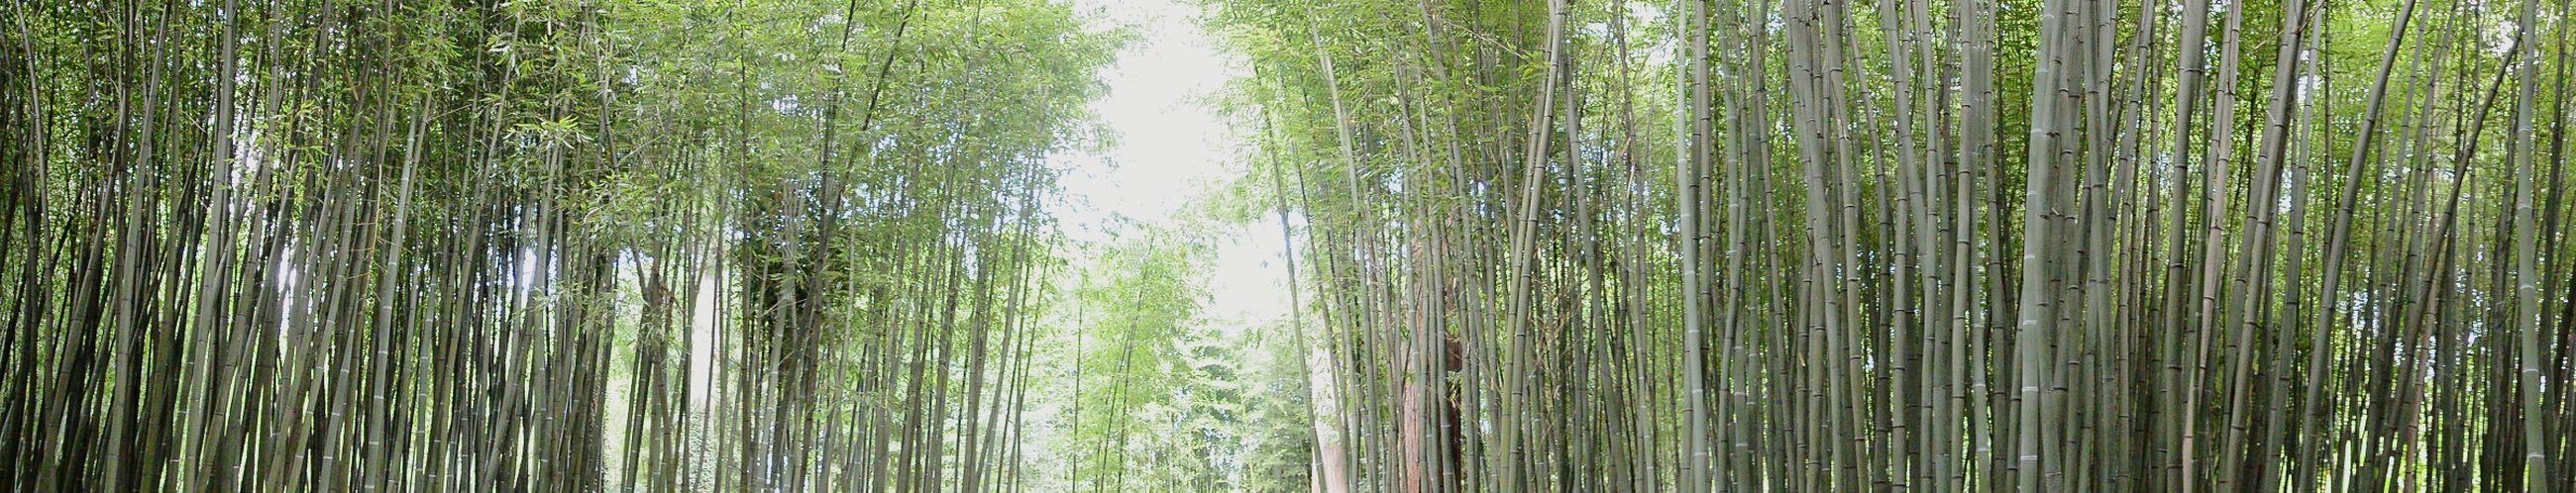 Petite vue panoramique autour d'une forêt de bambous Panoramic View Bamboo Forest La Bambouseraie Anduze Holiday Memories South France